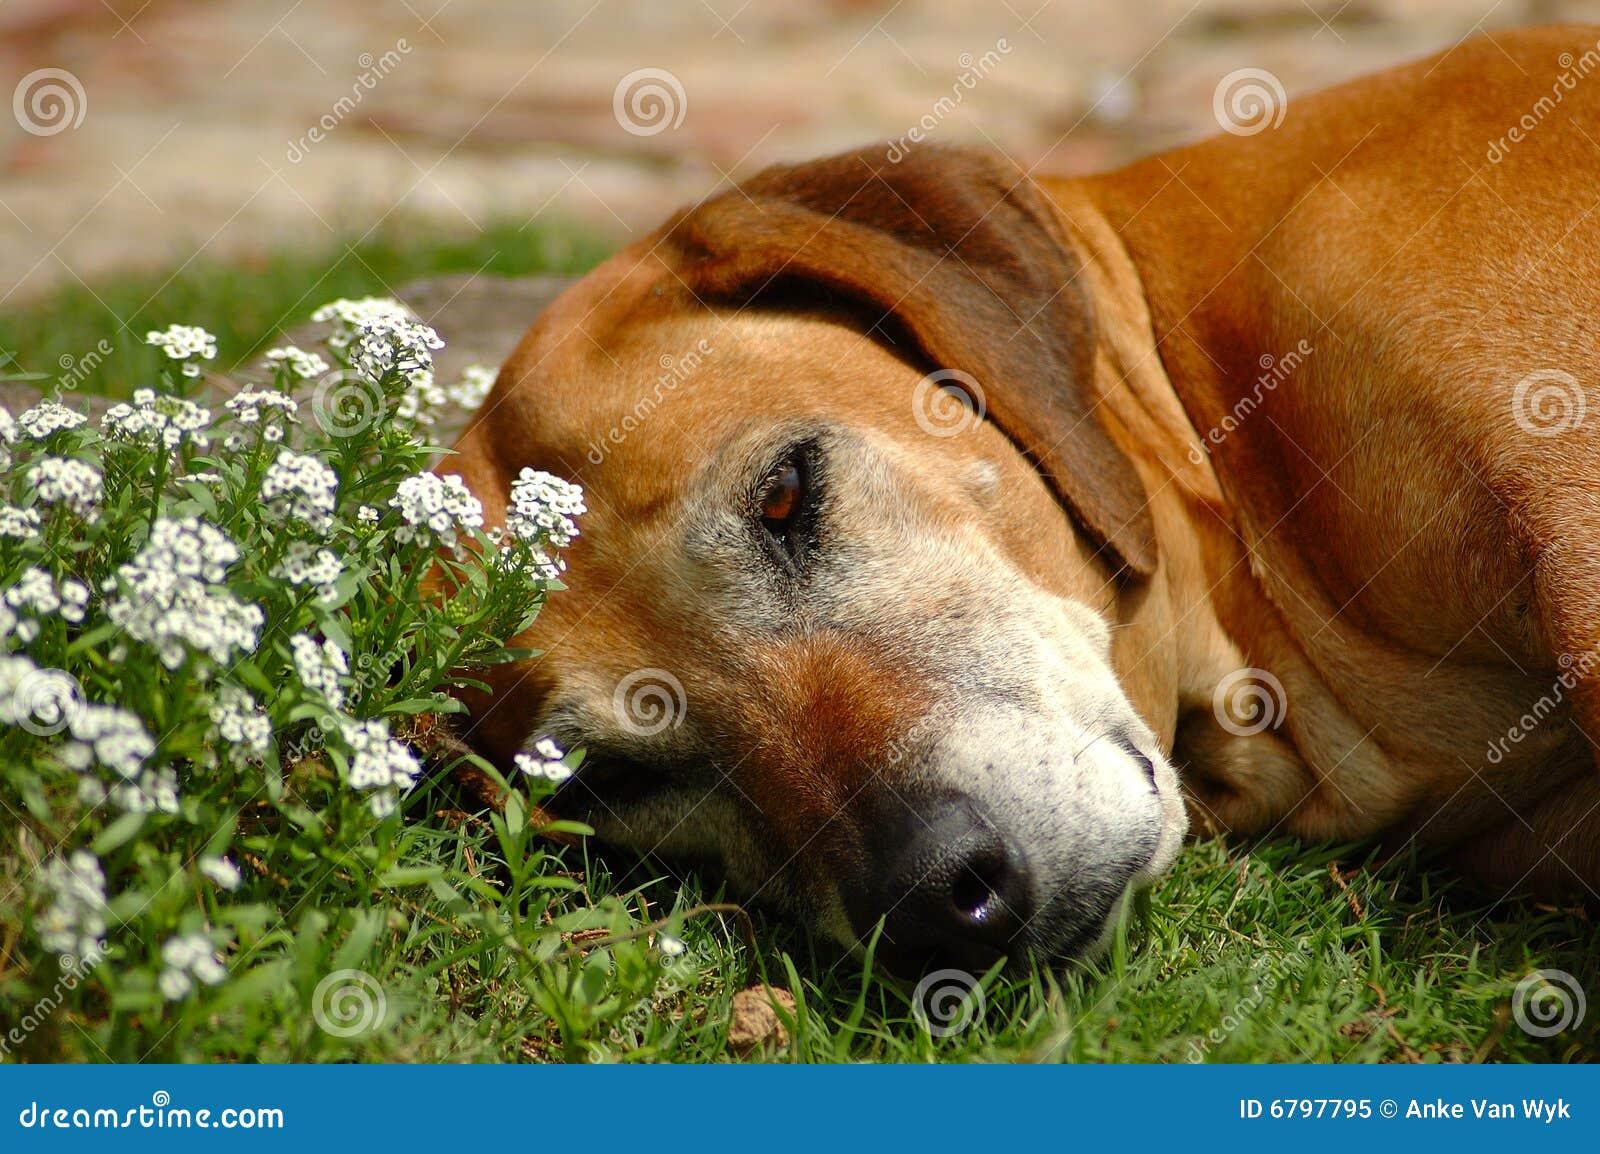 Old dog resting stock image. Image of grey, flower, adult